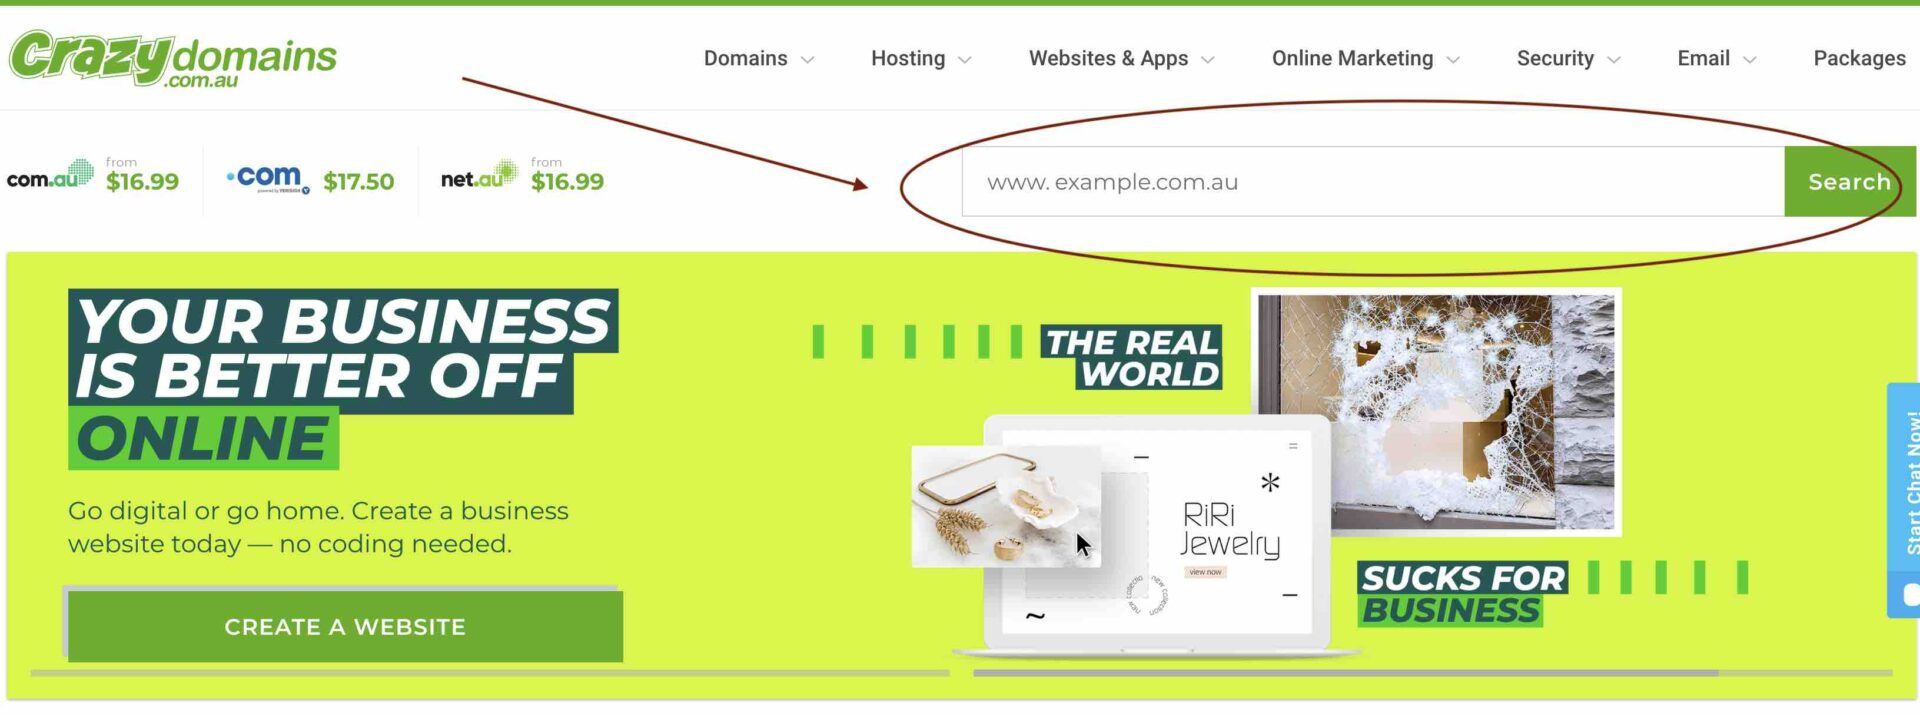 domain name registration - seo sydney experts